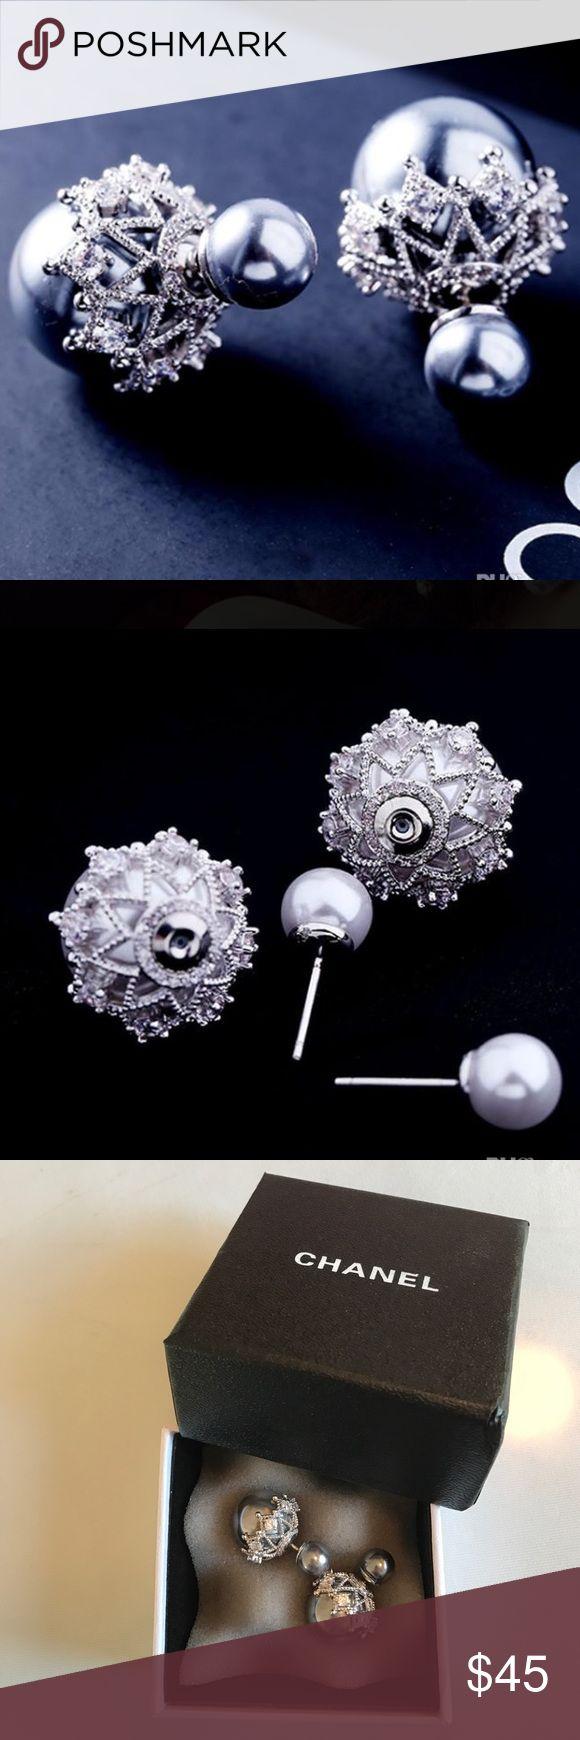 Dior tribal pearl style diamond earrings New! Dior tribal style earrings. Very pretty earrings. In Chanel box. Very high quality. No box Dior Jewelry Earrings